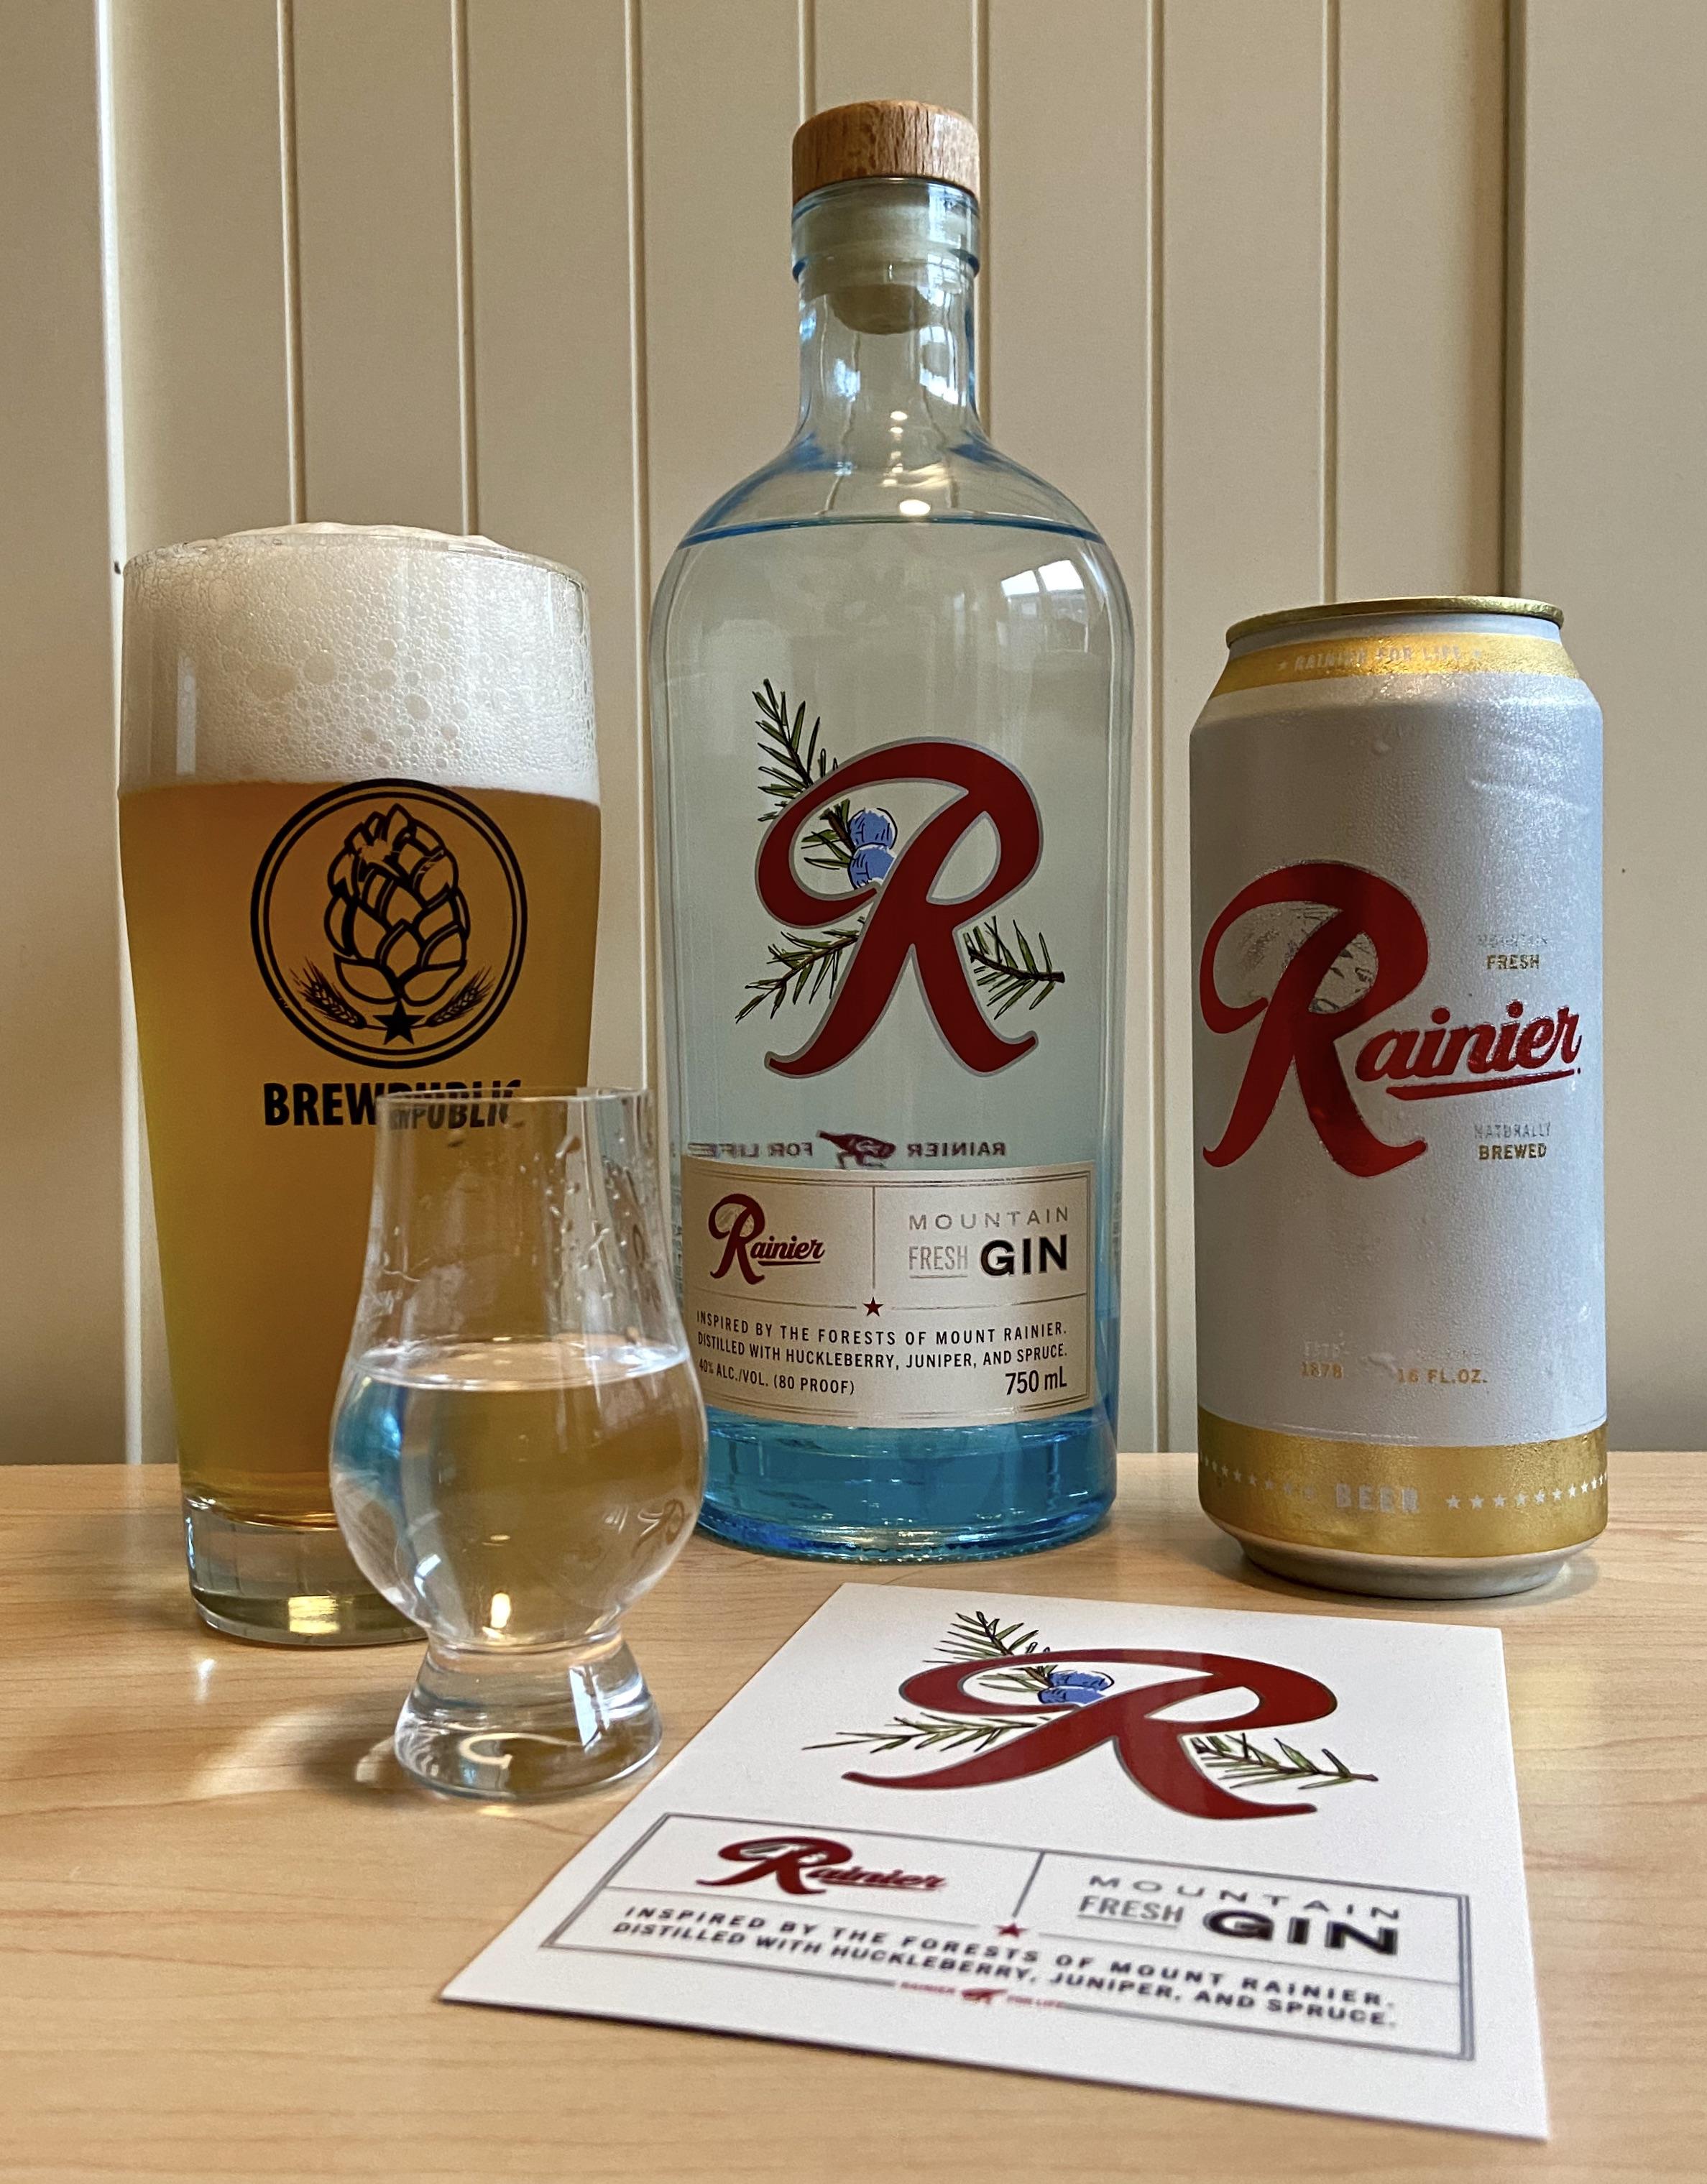 Rainier Mountain Fresh Gin with a Rainier Beer back.